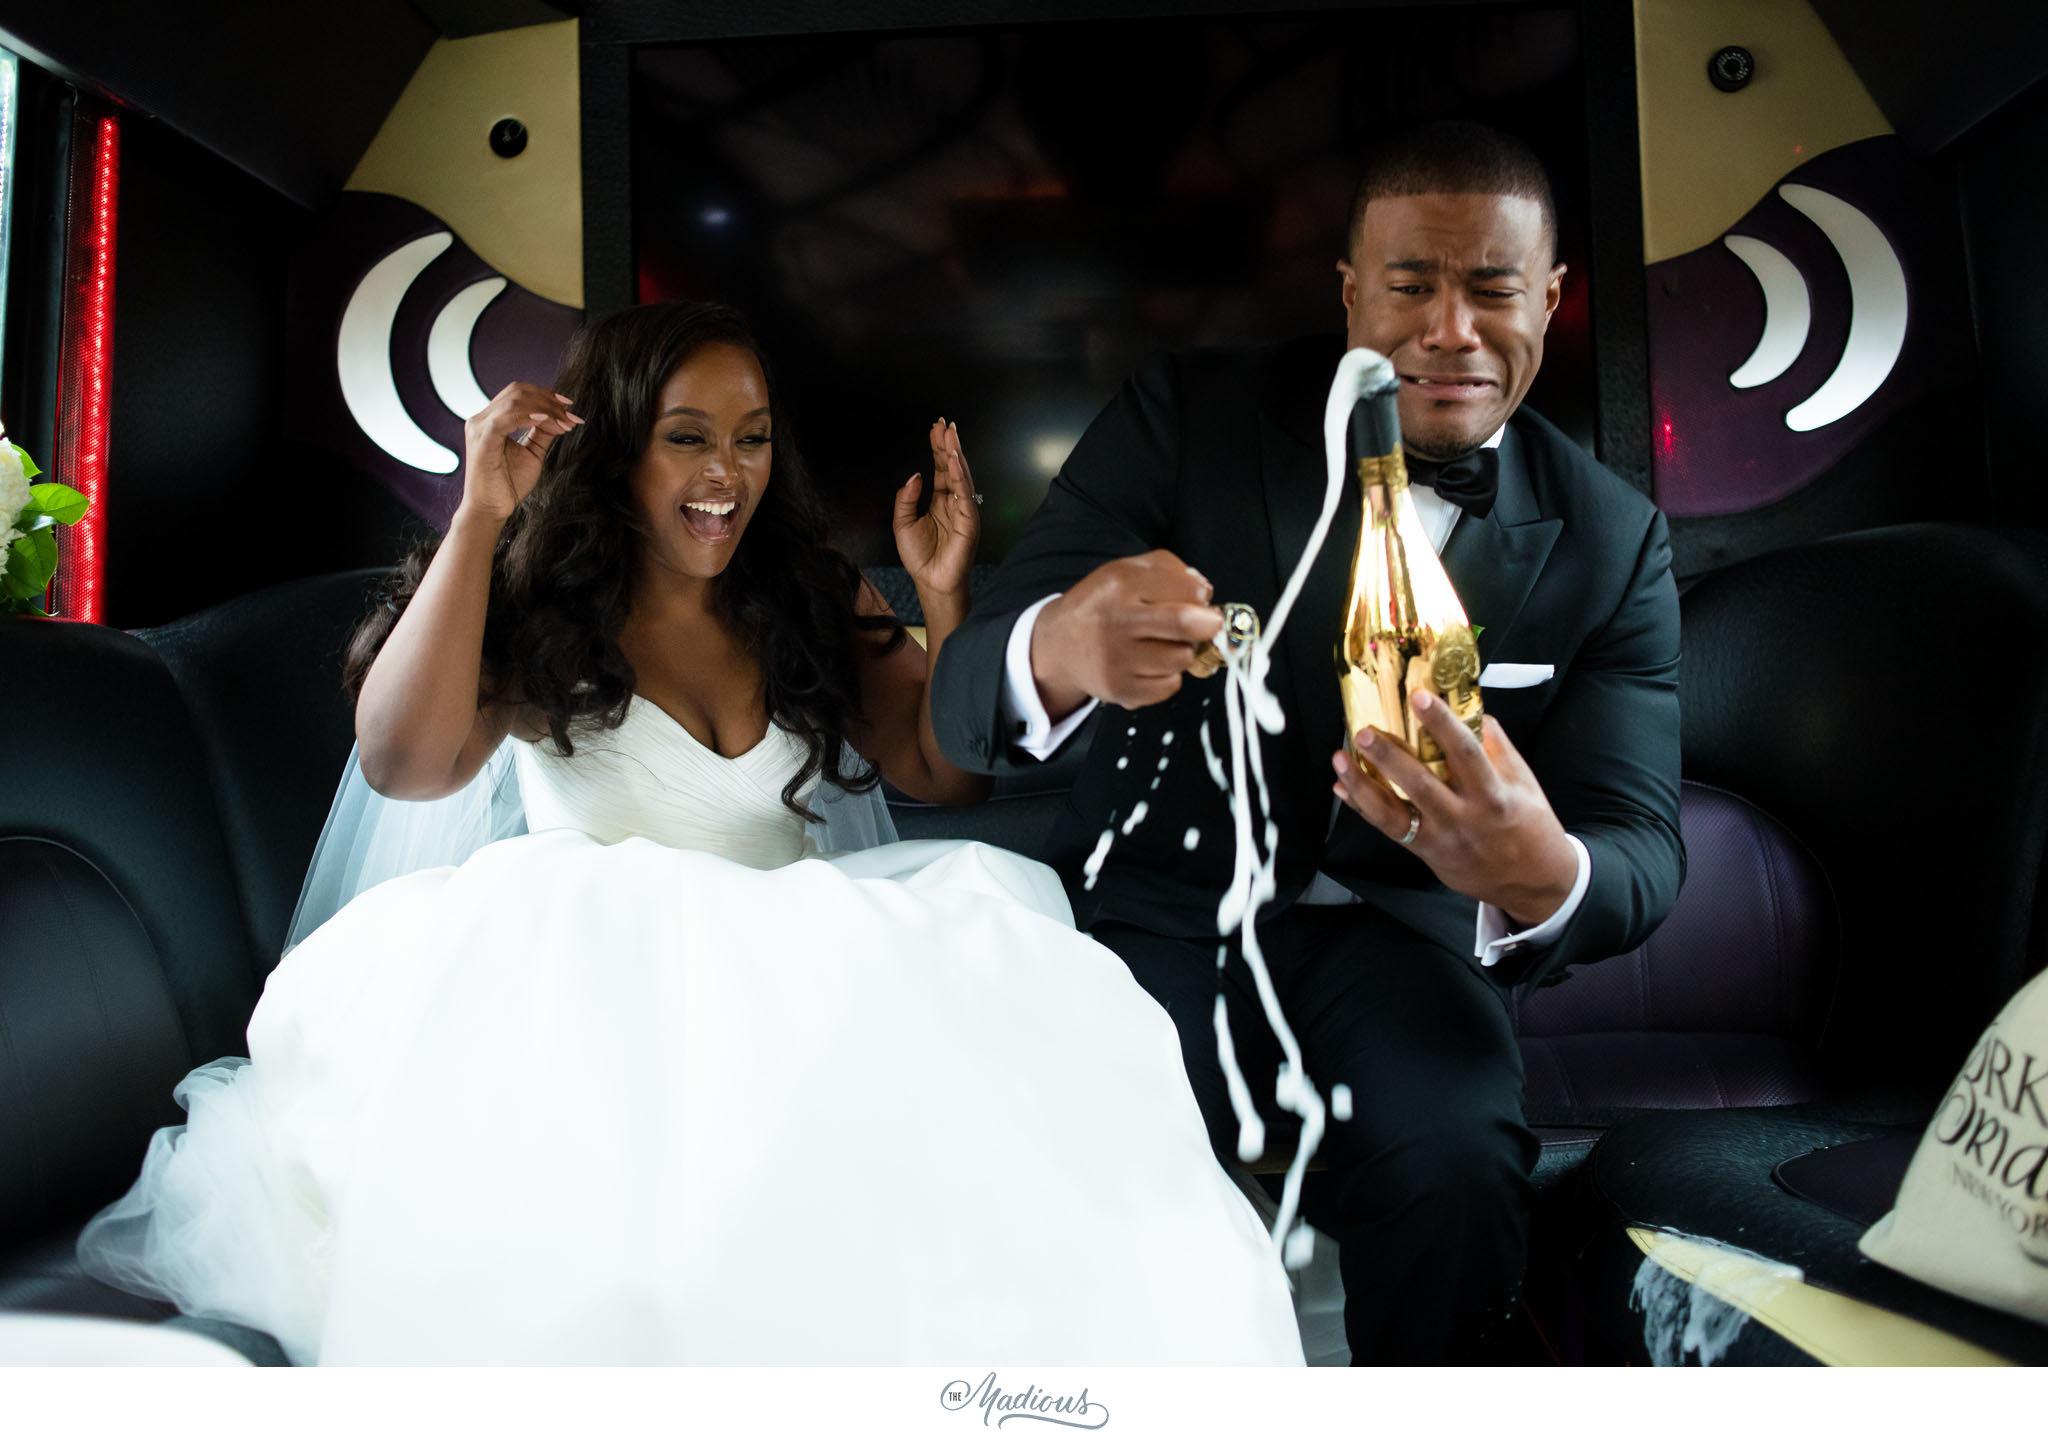 nmwa+wedding,+women+in+the+arts+wedding,+ethiopian+wedding,+dc+wedding+0118.jpg